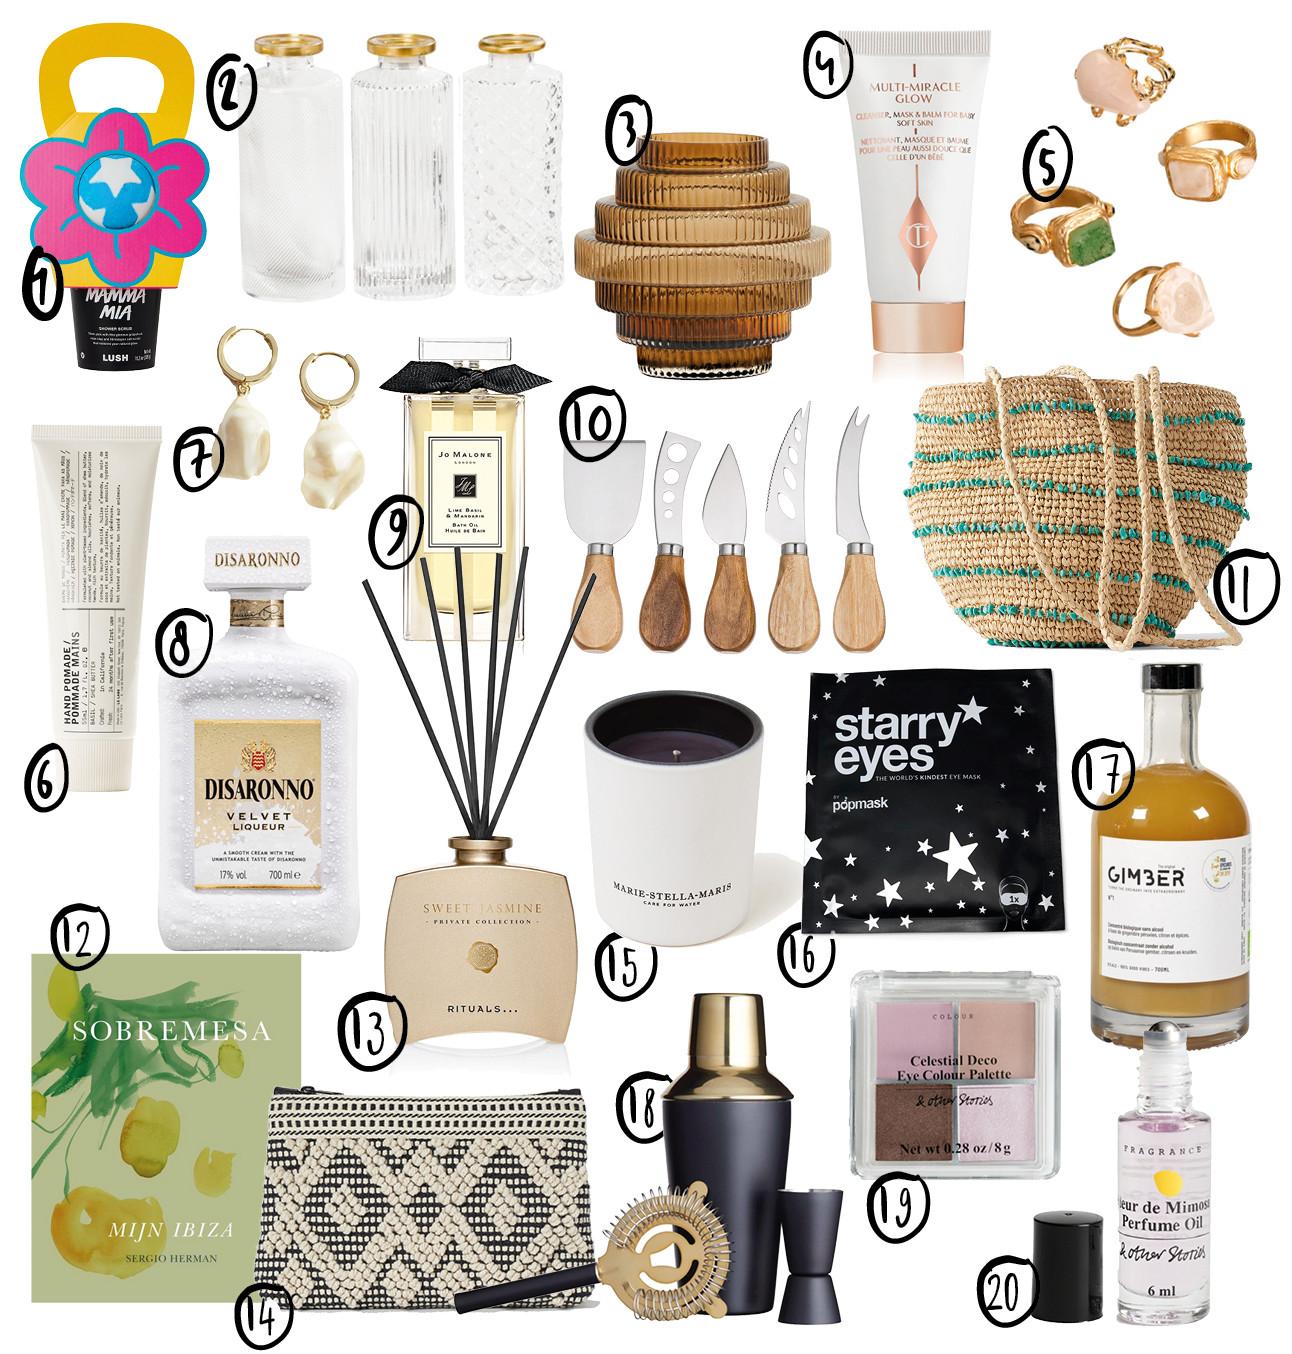 moederdag shopping items